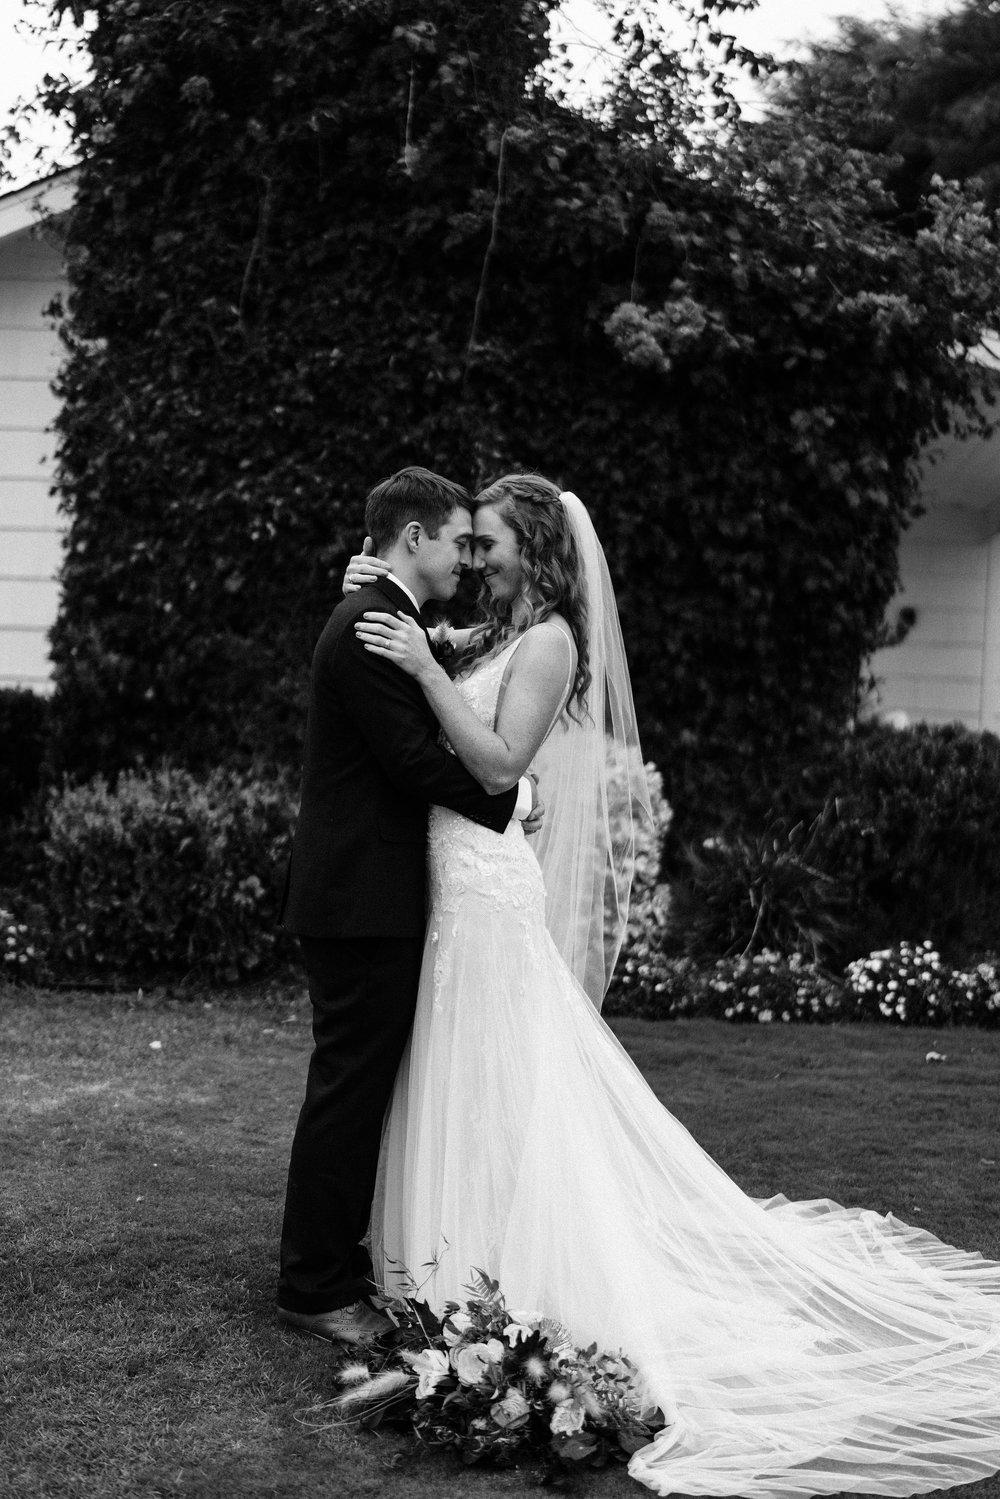 allie-shupe-tyler-wiggins-wedding-santa-barbara 124.jpg